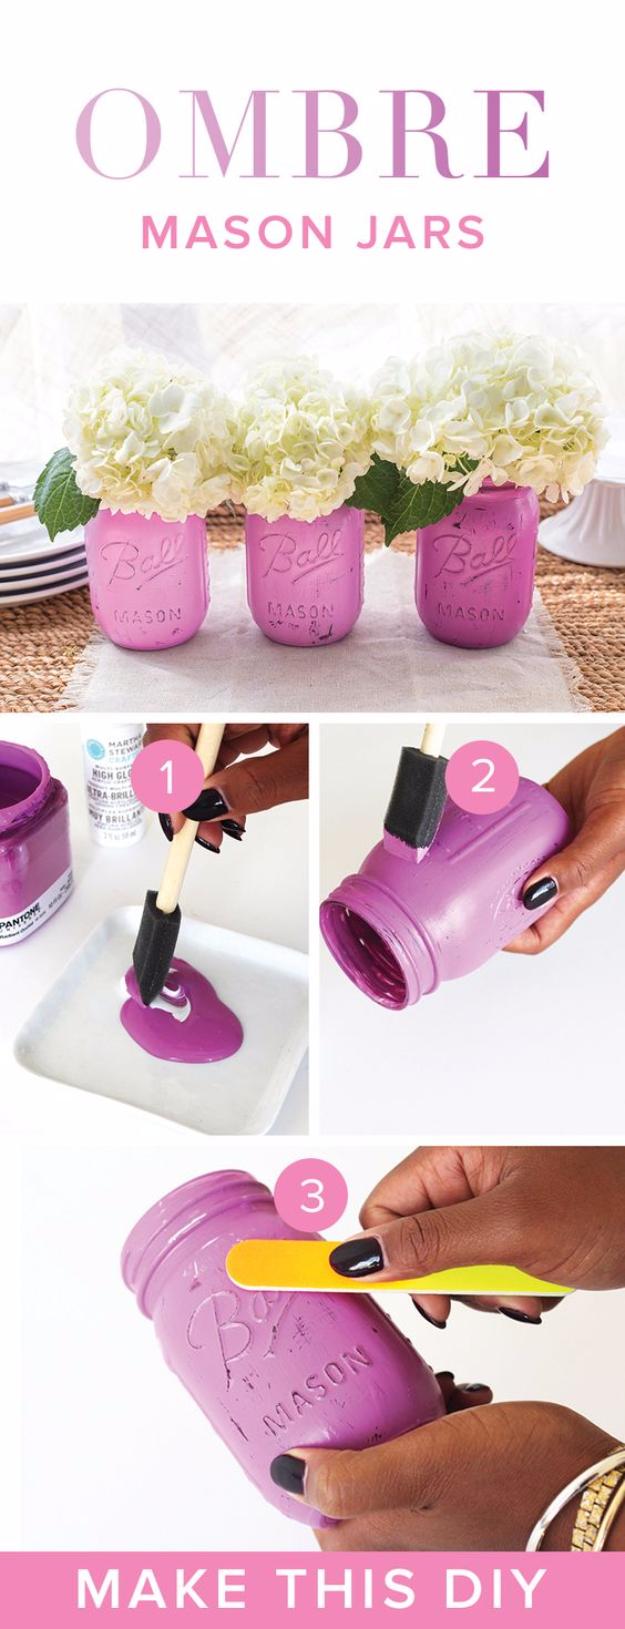 DIY Mason Jar Vases - Purple Ombre Mason Jar Vases - Best Vase Projects and Ideas for Mason Jars - Painted, Wedding, Hanging Flowers, Centerpiece, Rustic Burlap, Ribbon and Twine